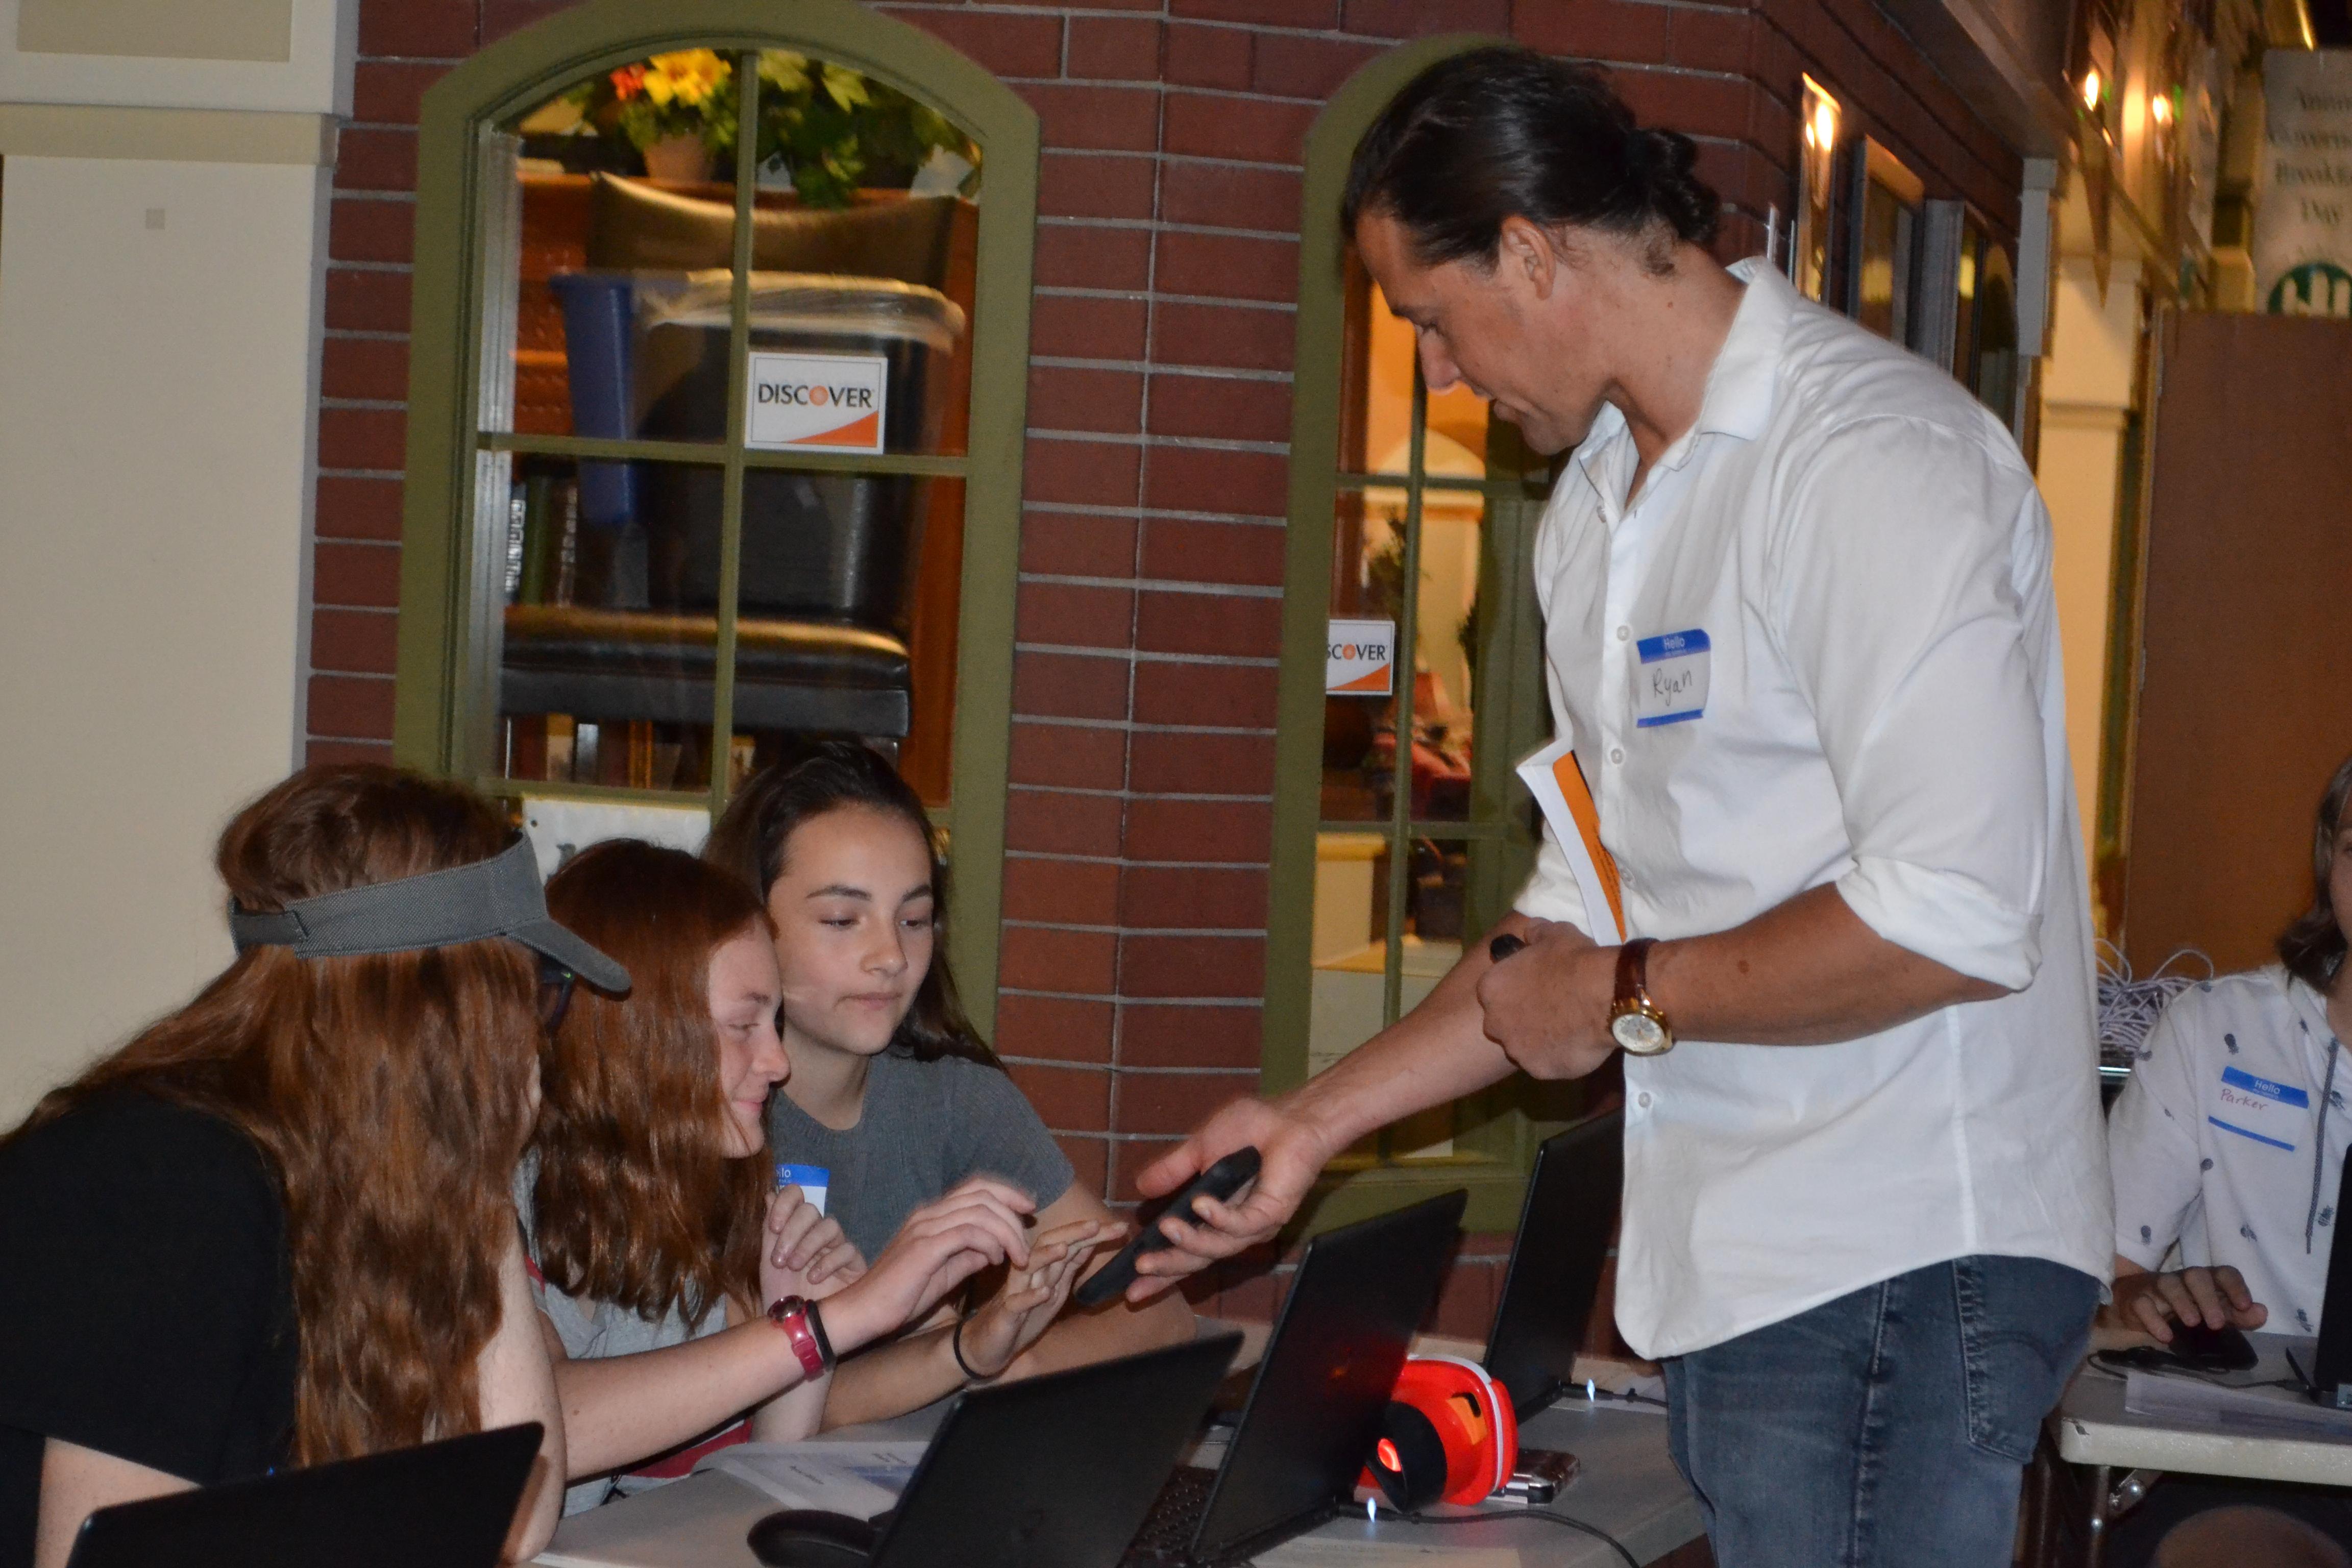 Ryan Buchanan showing students mobile device